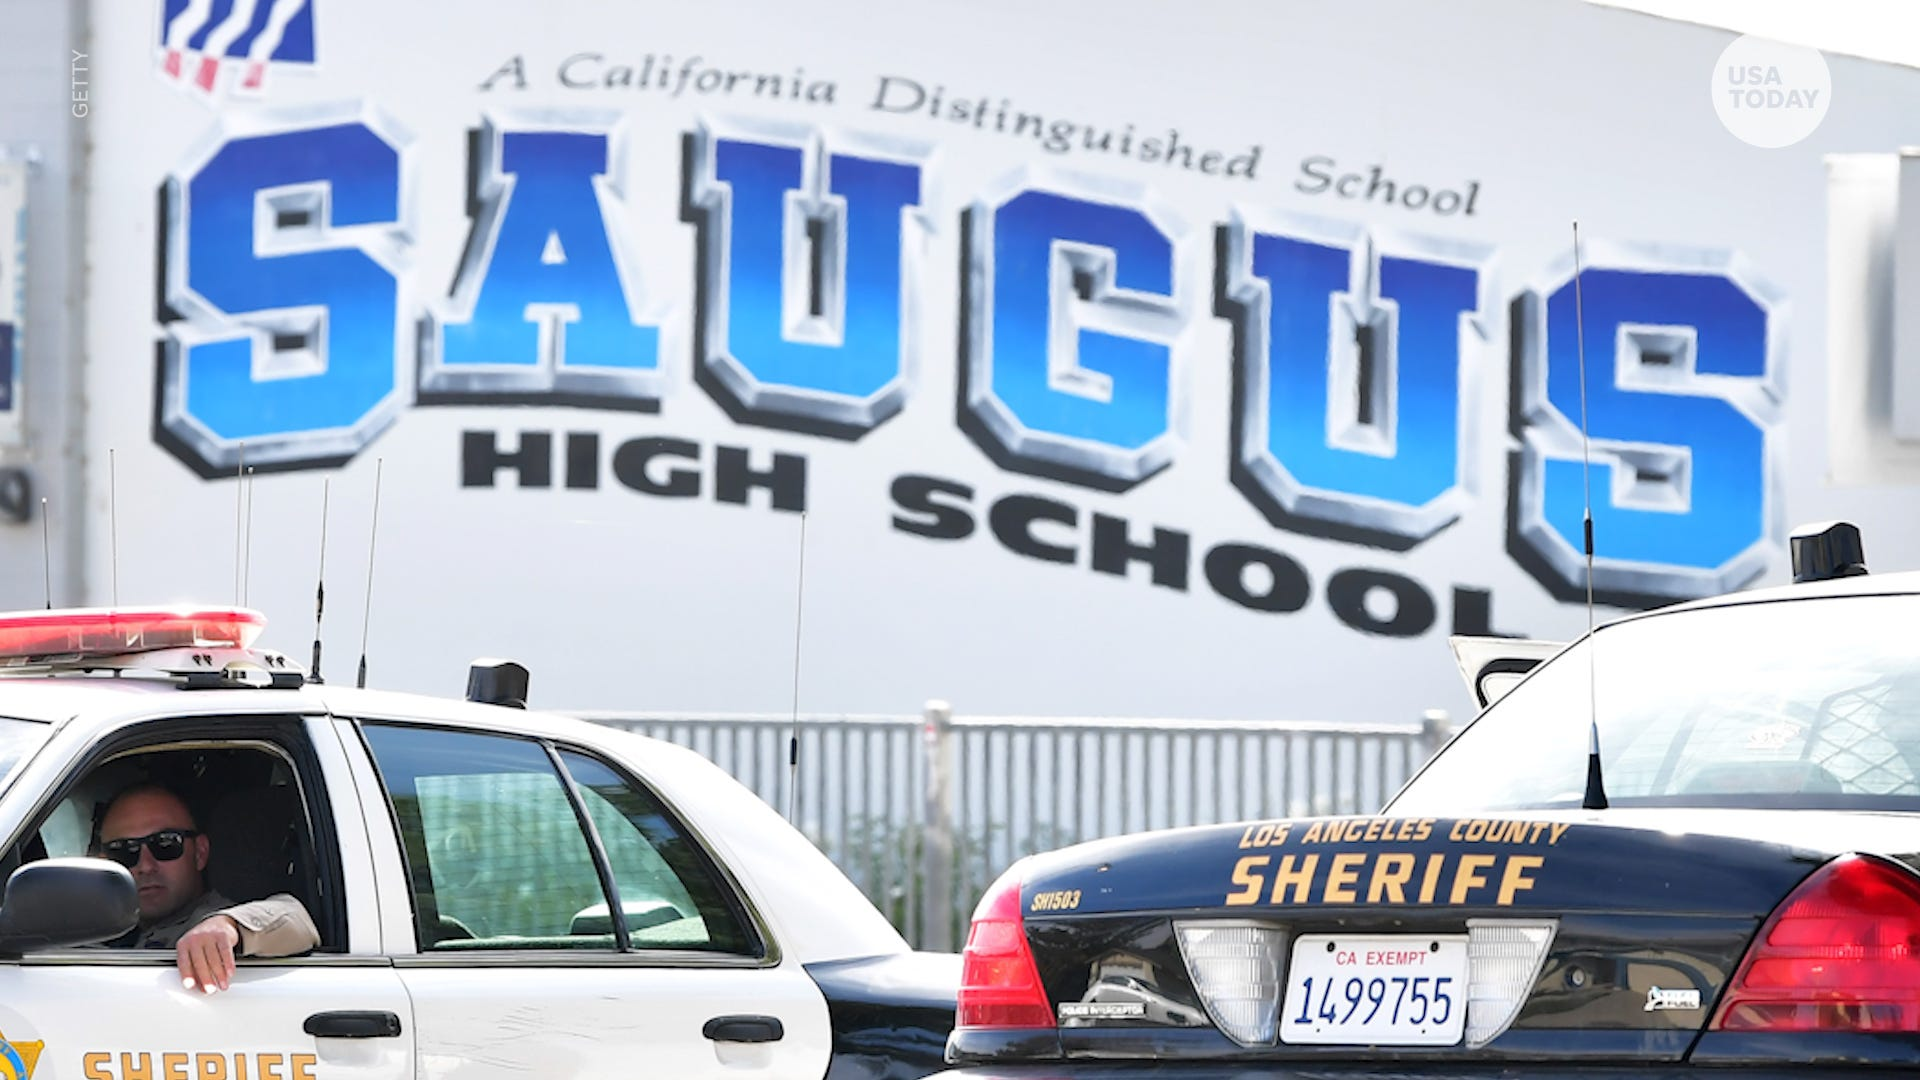 Teen gunman who killed two in shooting rampage at California high school dies in hospital